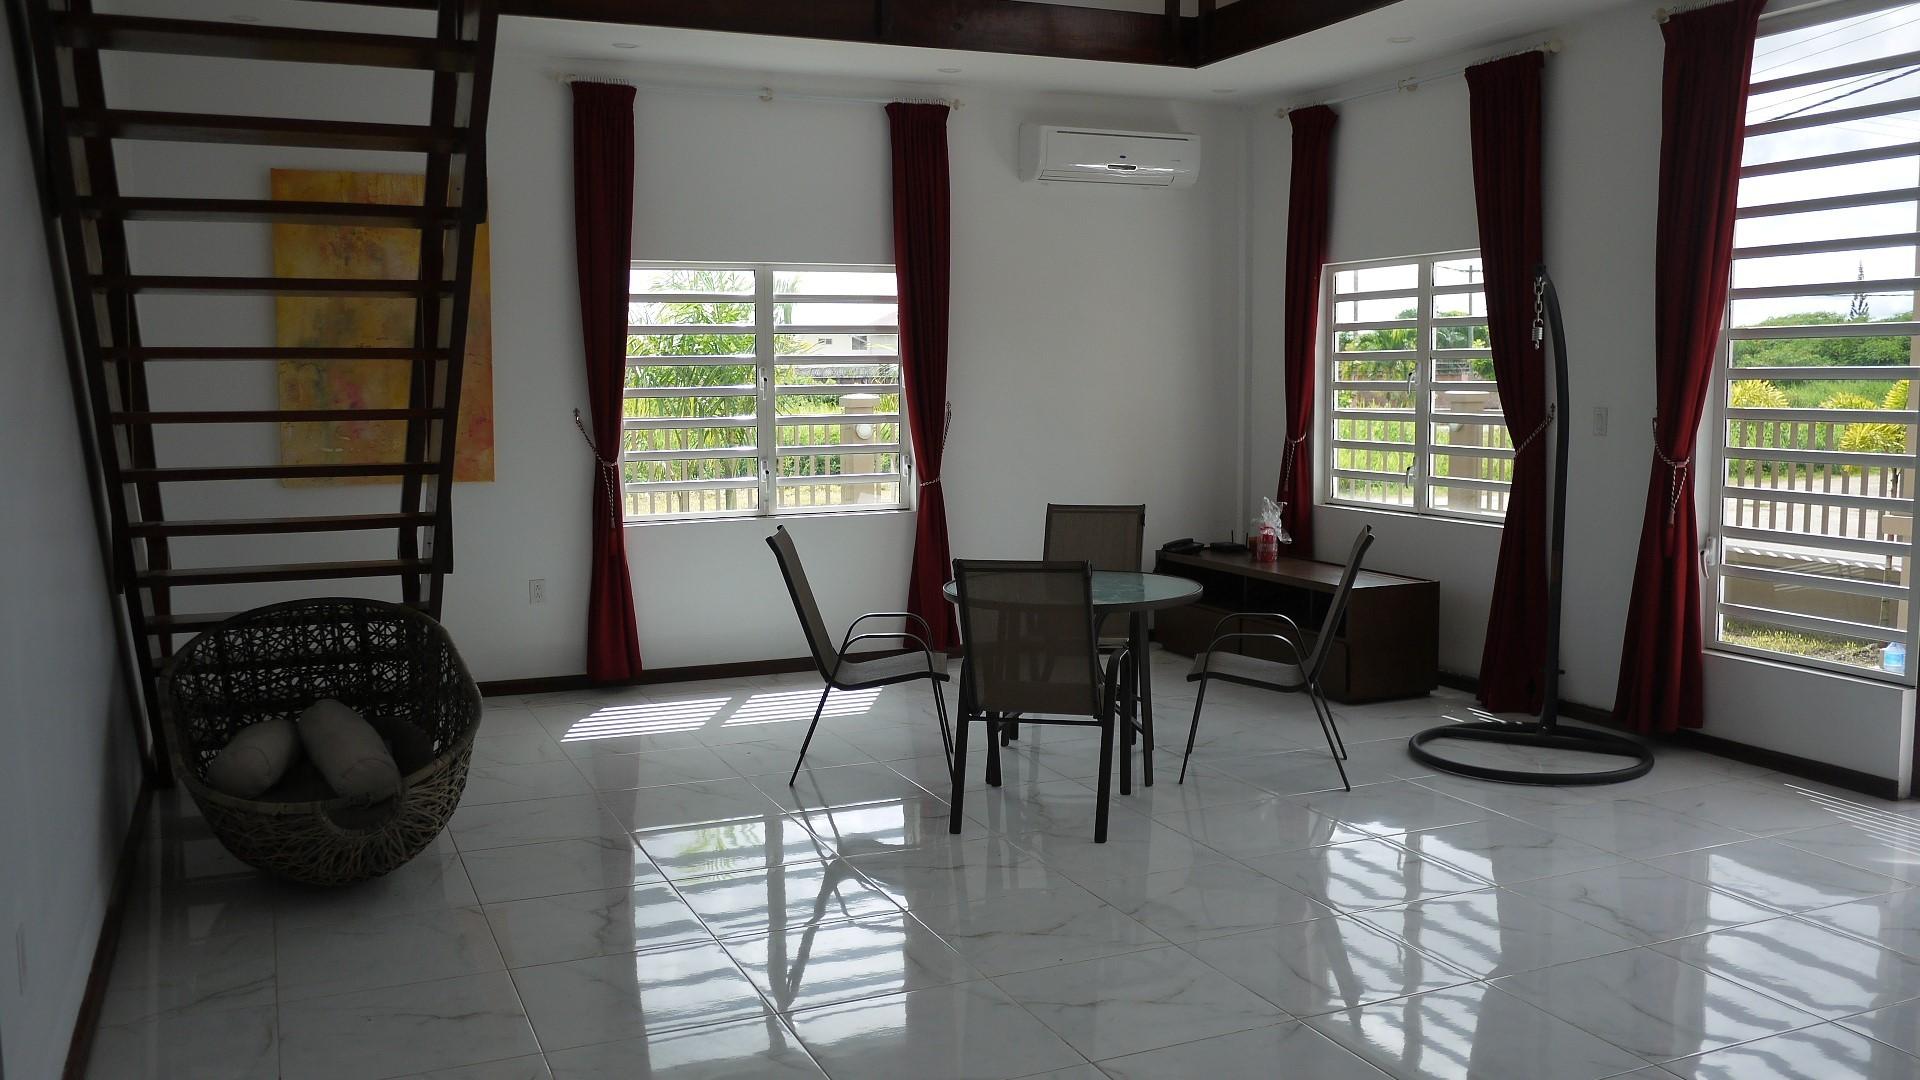 Gansistraat-Morgenstond-Paramaribo-Suriname-Terzol-Vastgoed-s21